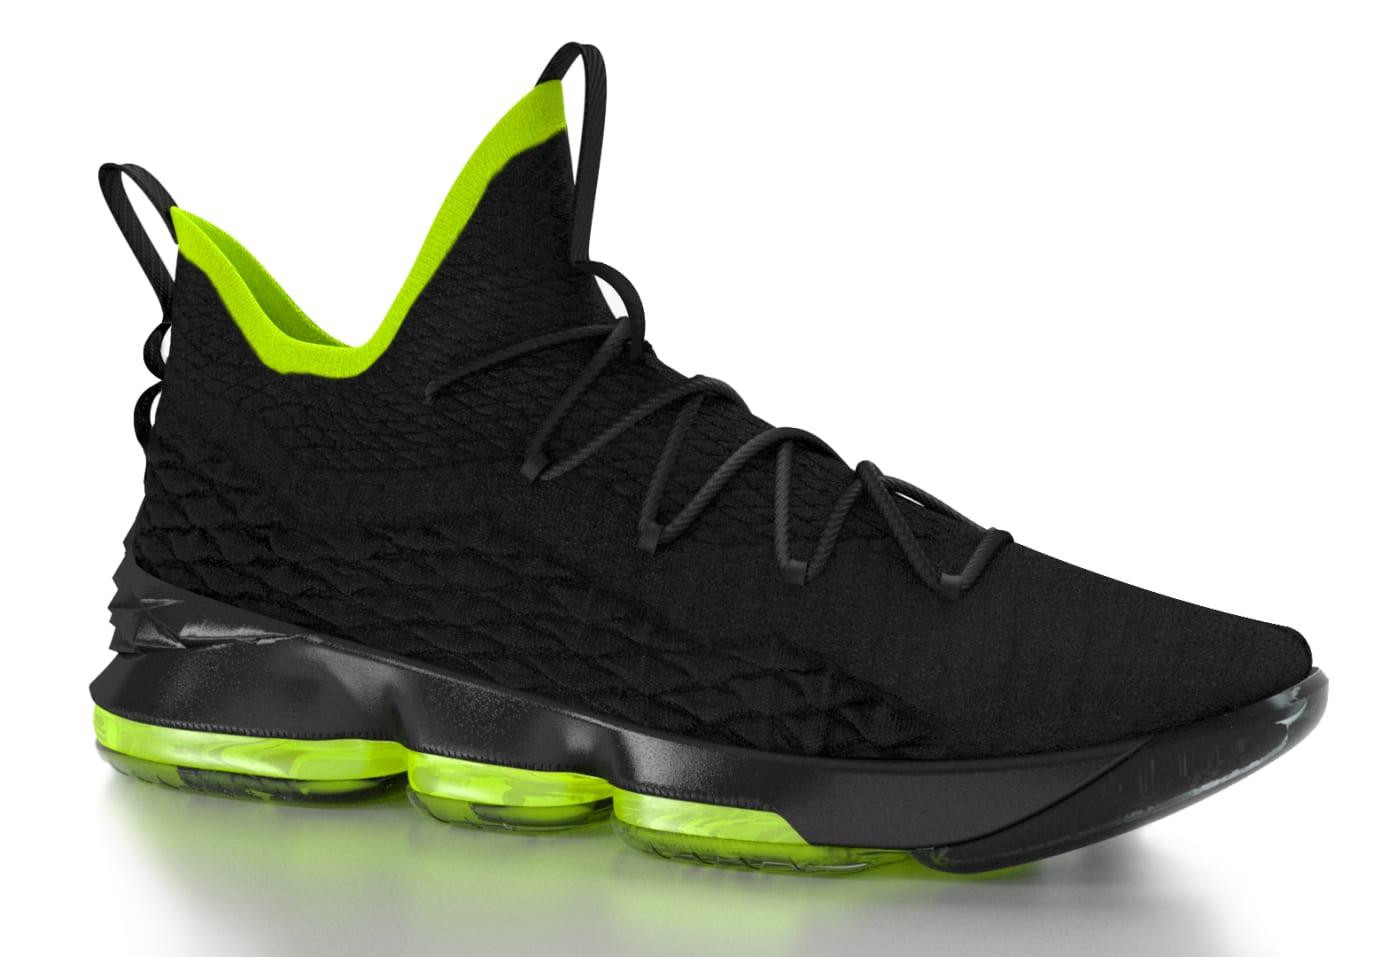 Nike LeBron 15 Black/Volt